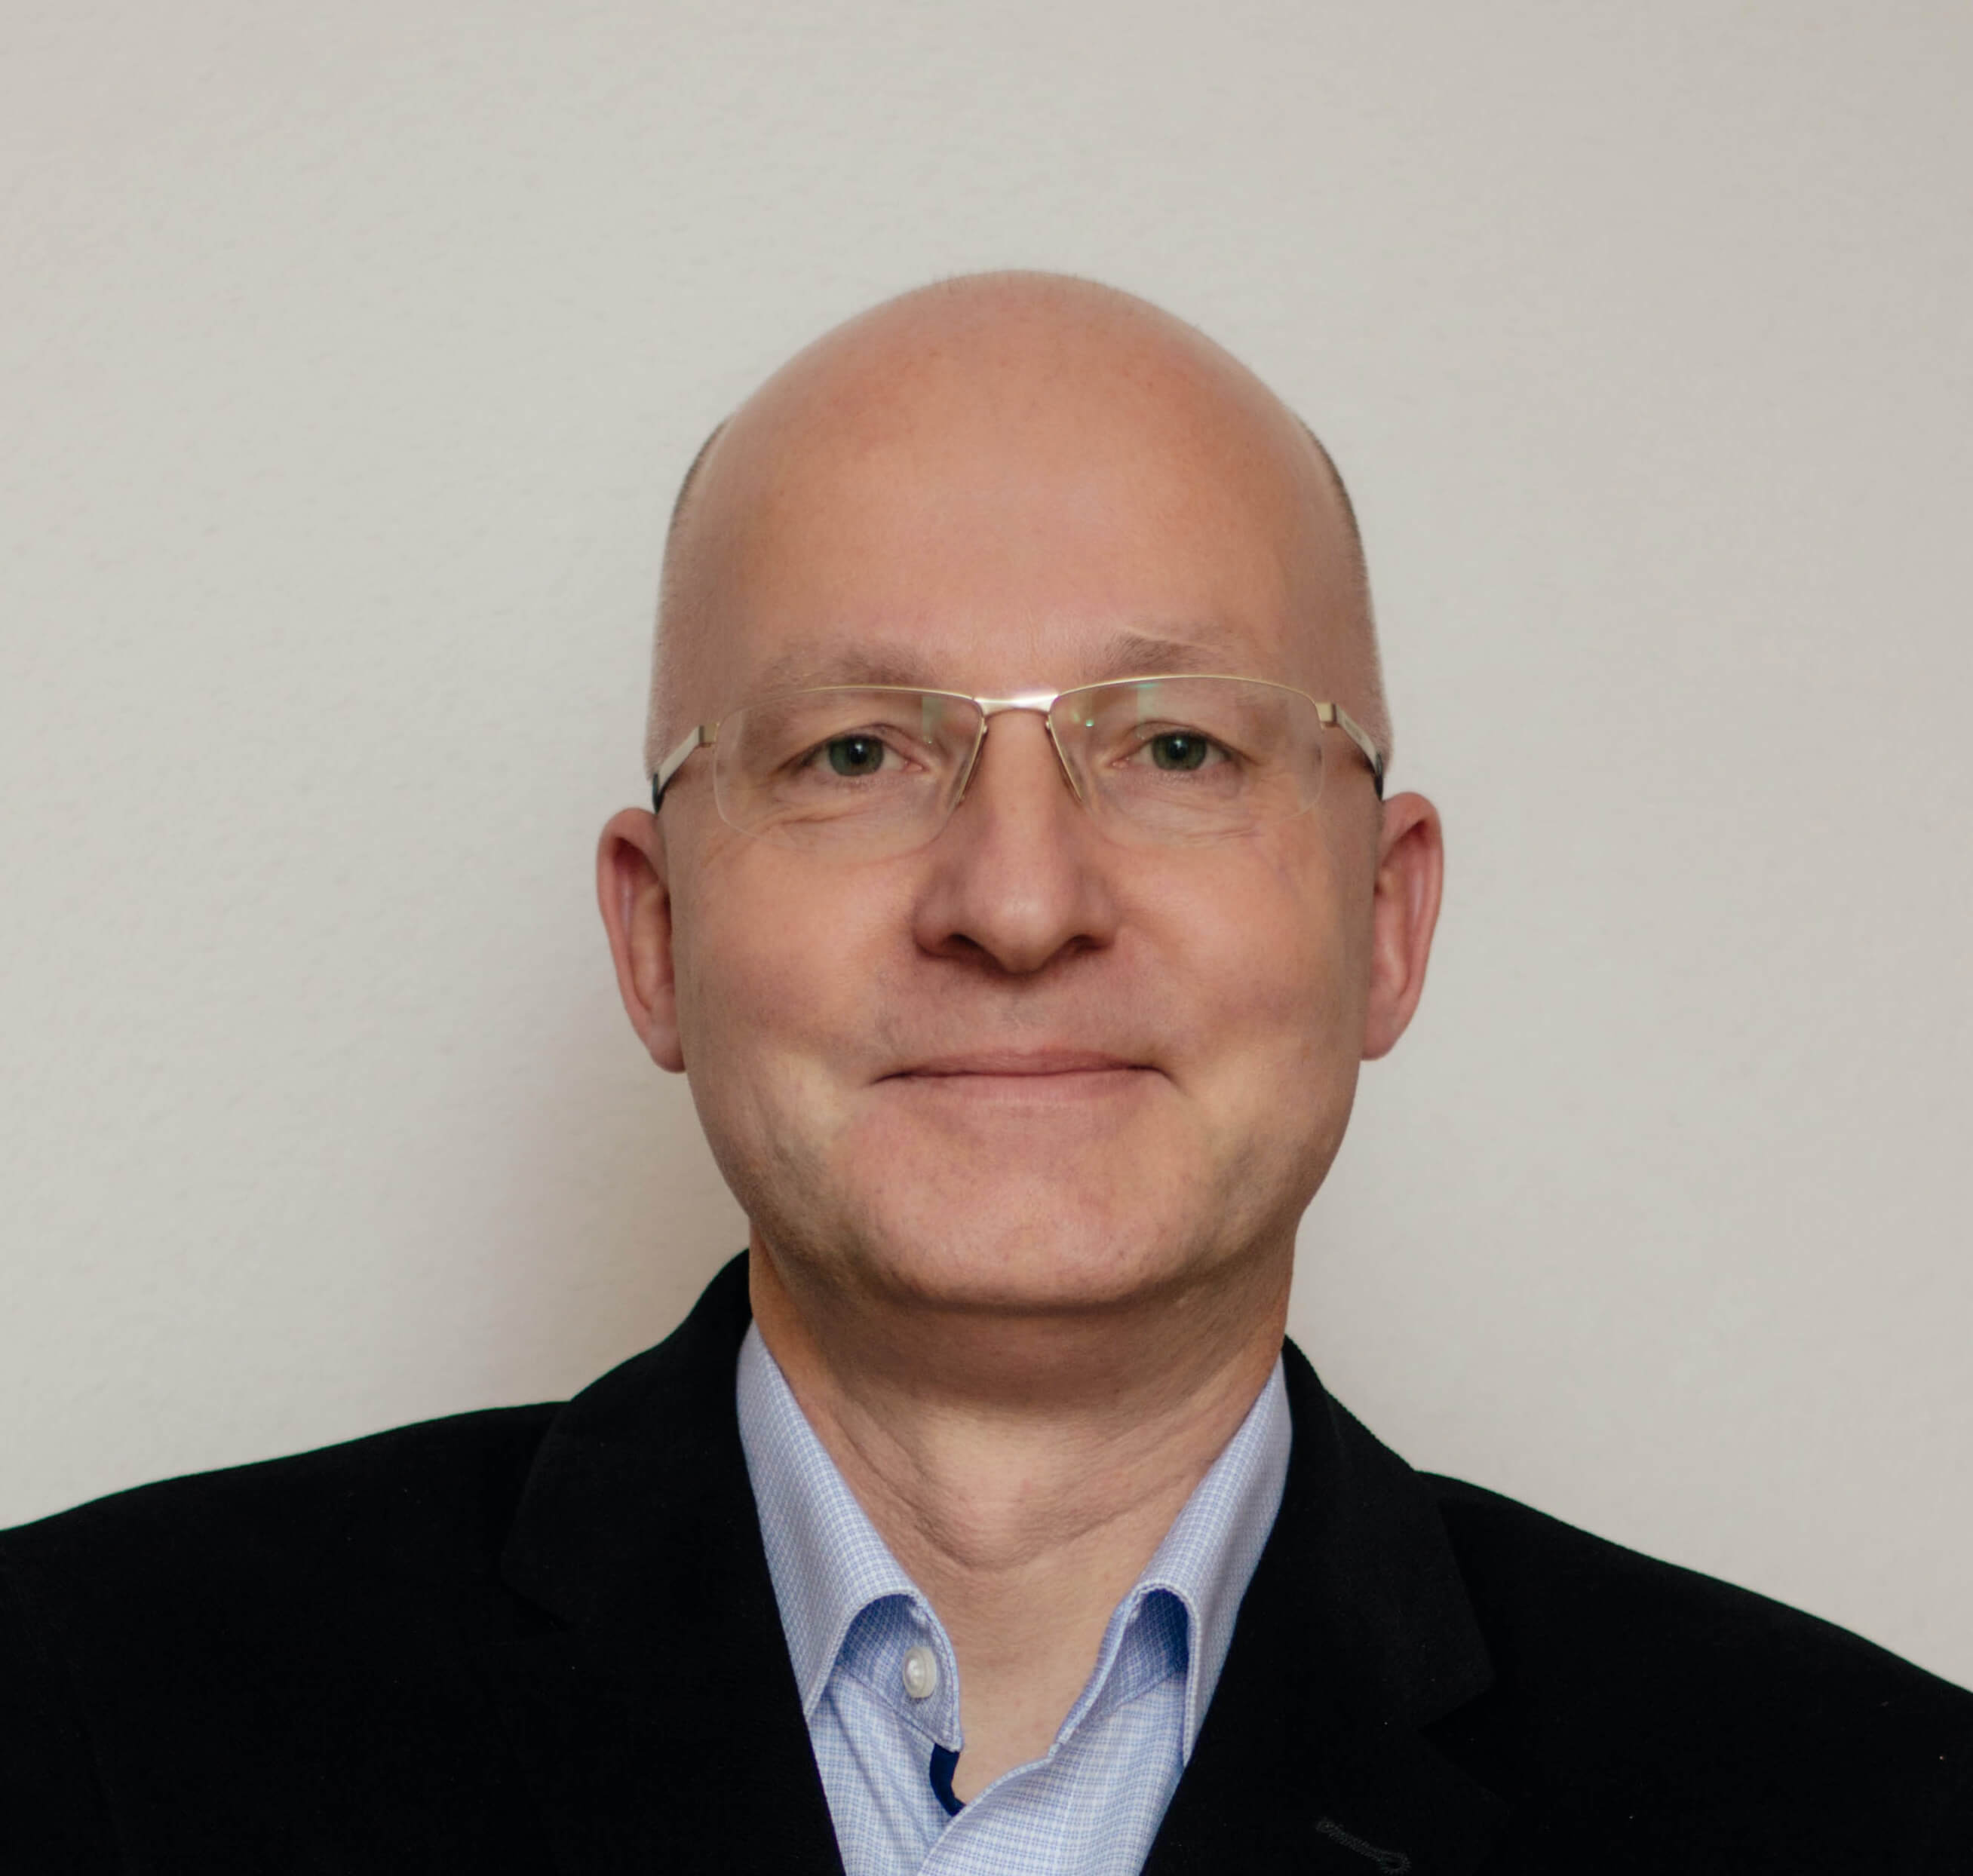 Oliver Brüggemann picture